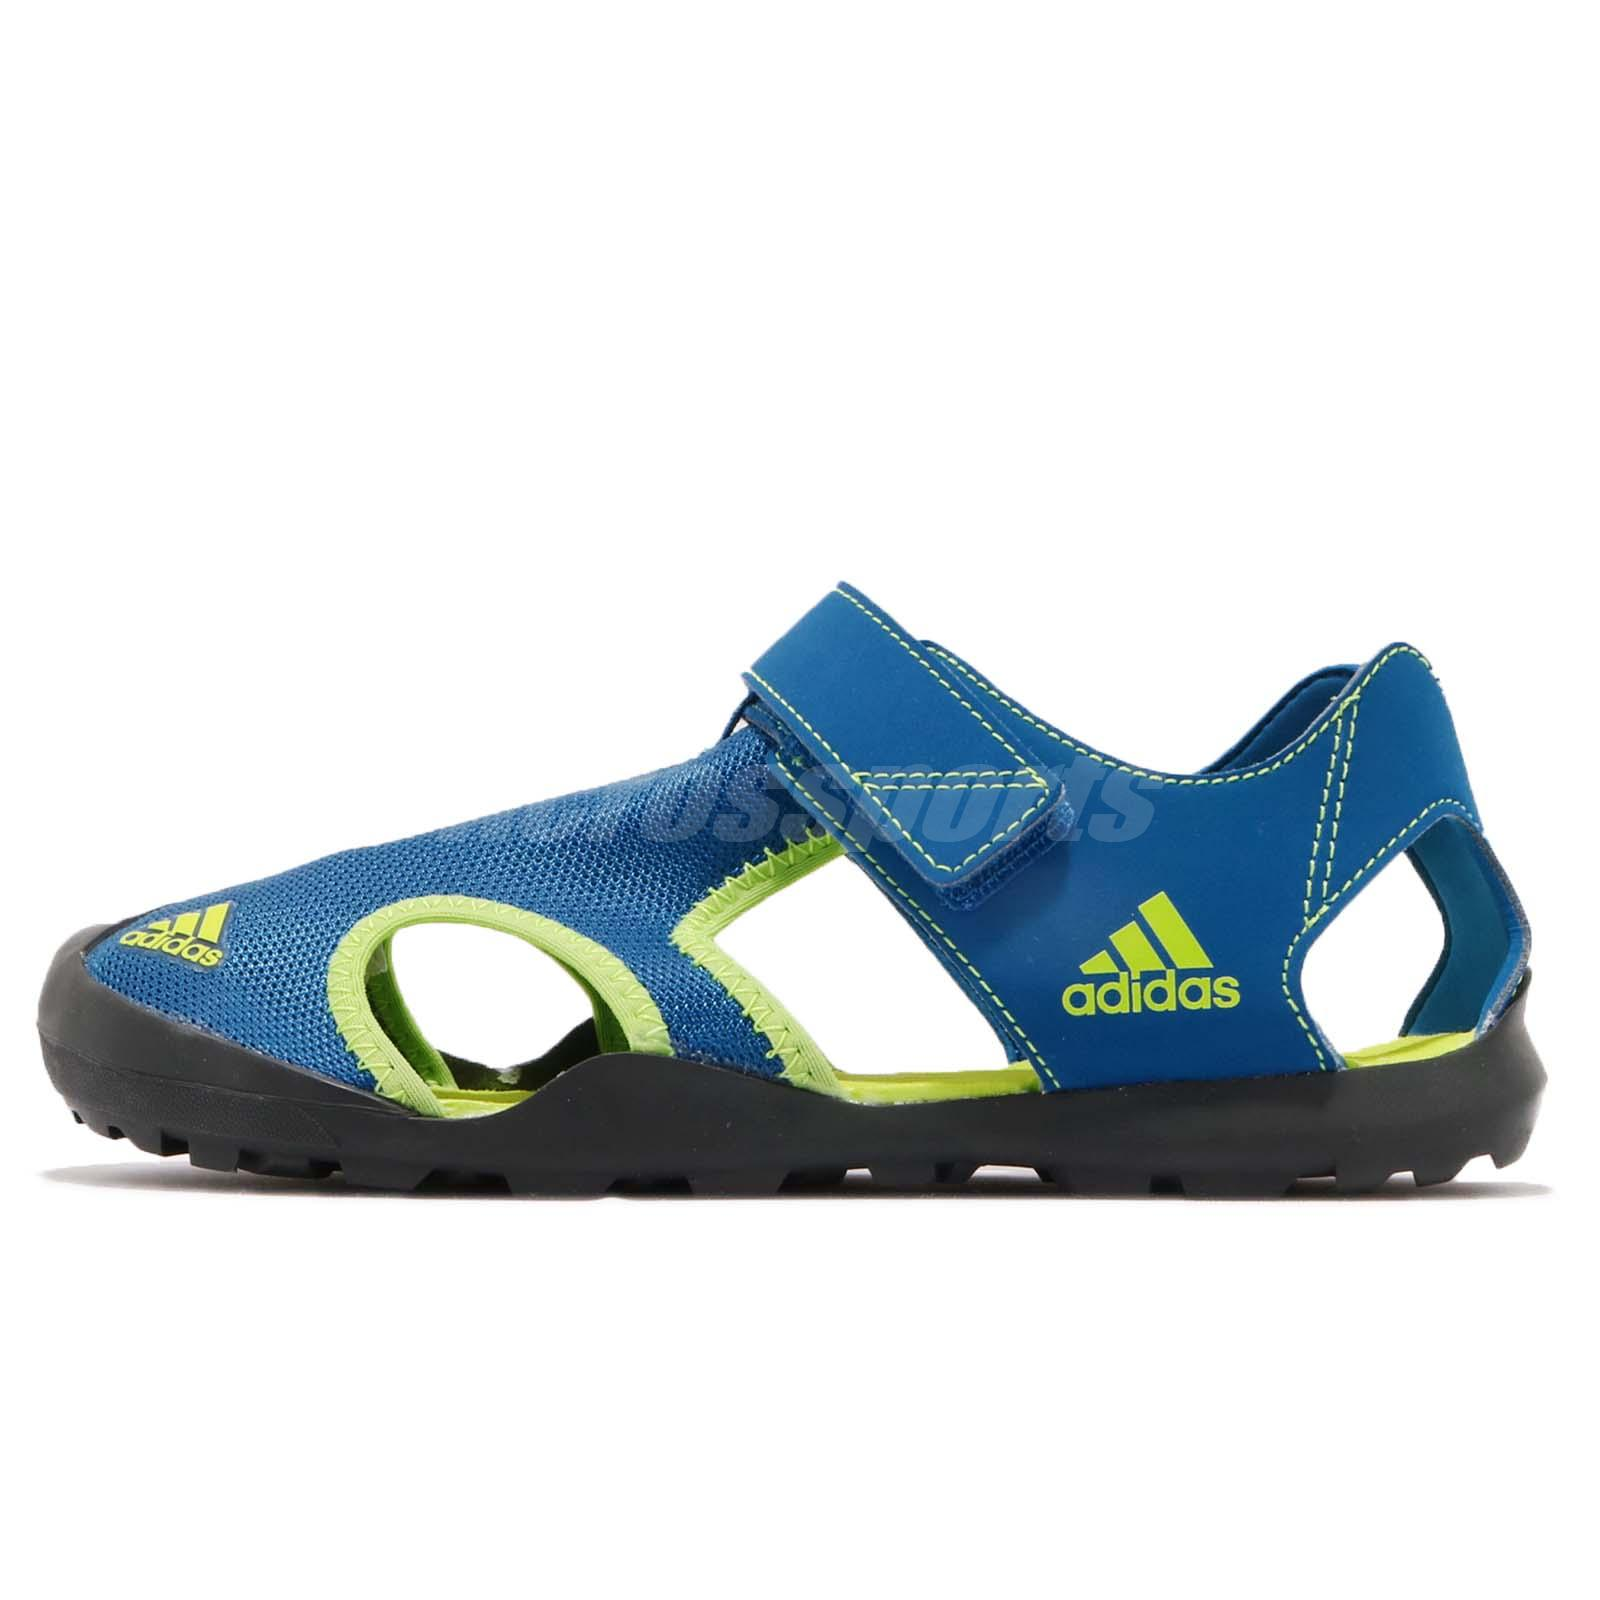 81b5a23fa adidas Captain Toey K Blue Solar Slime Kid Junior Outdoor Sandal Shoes  CM7639